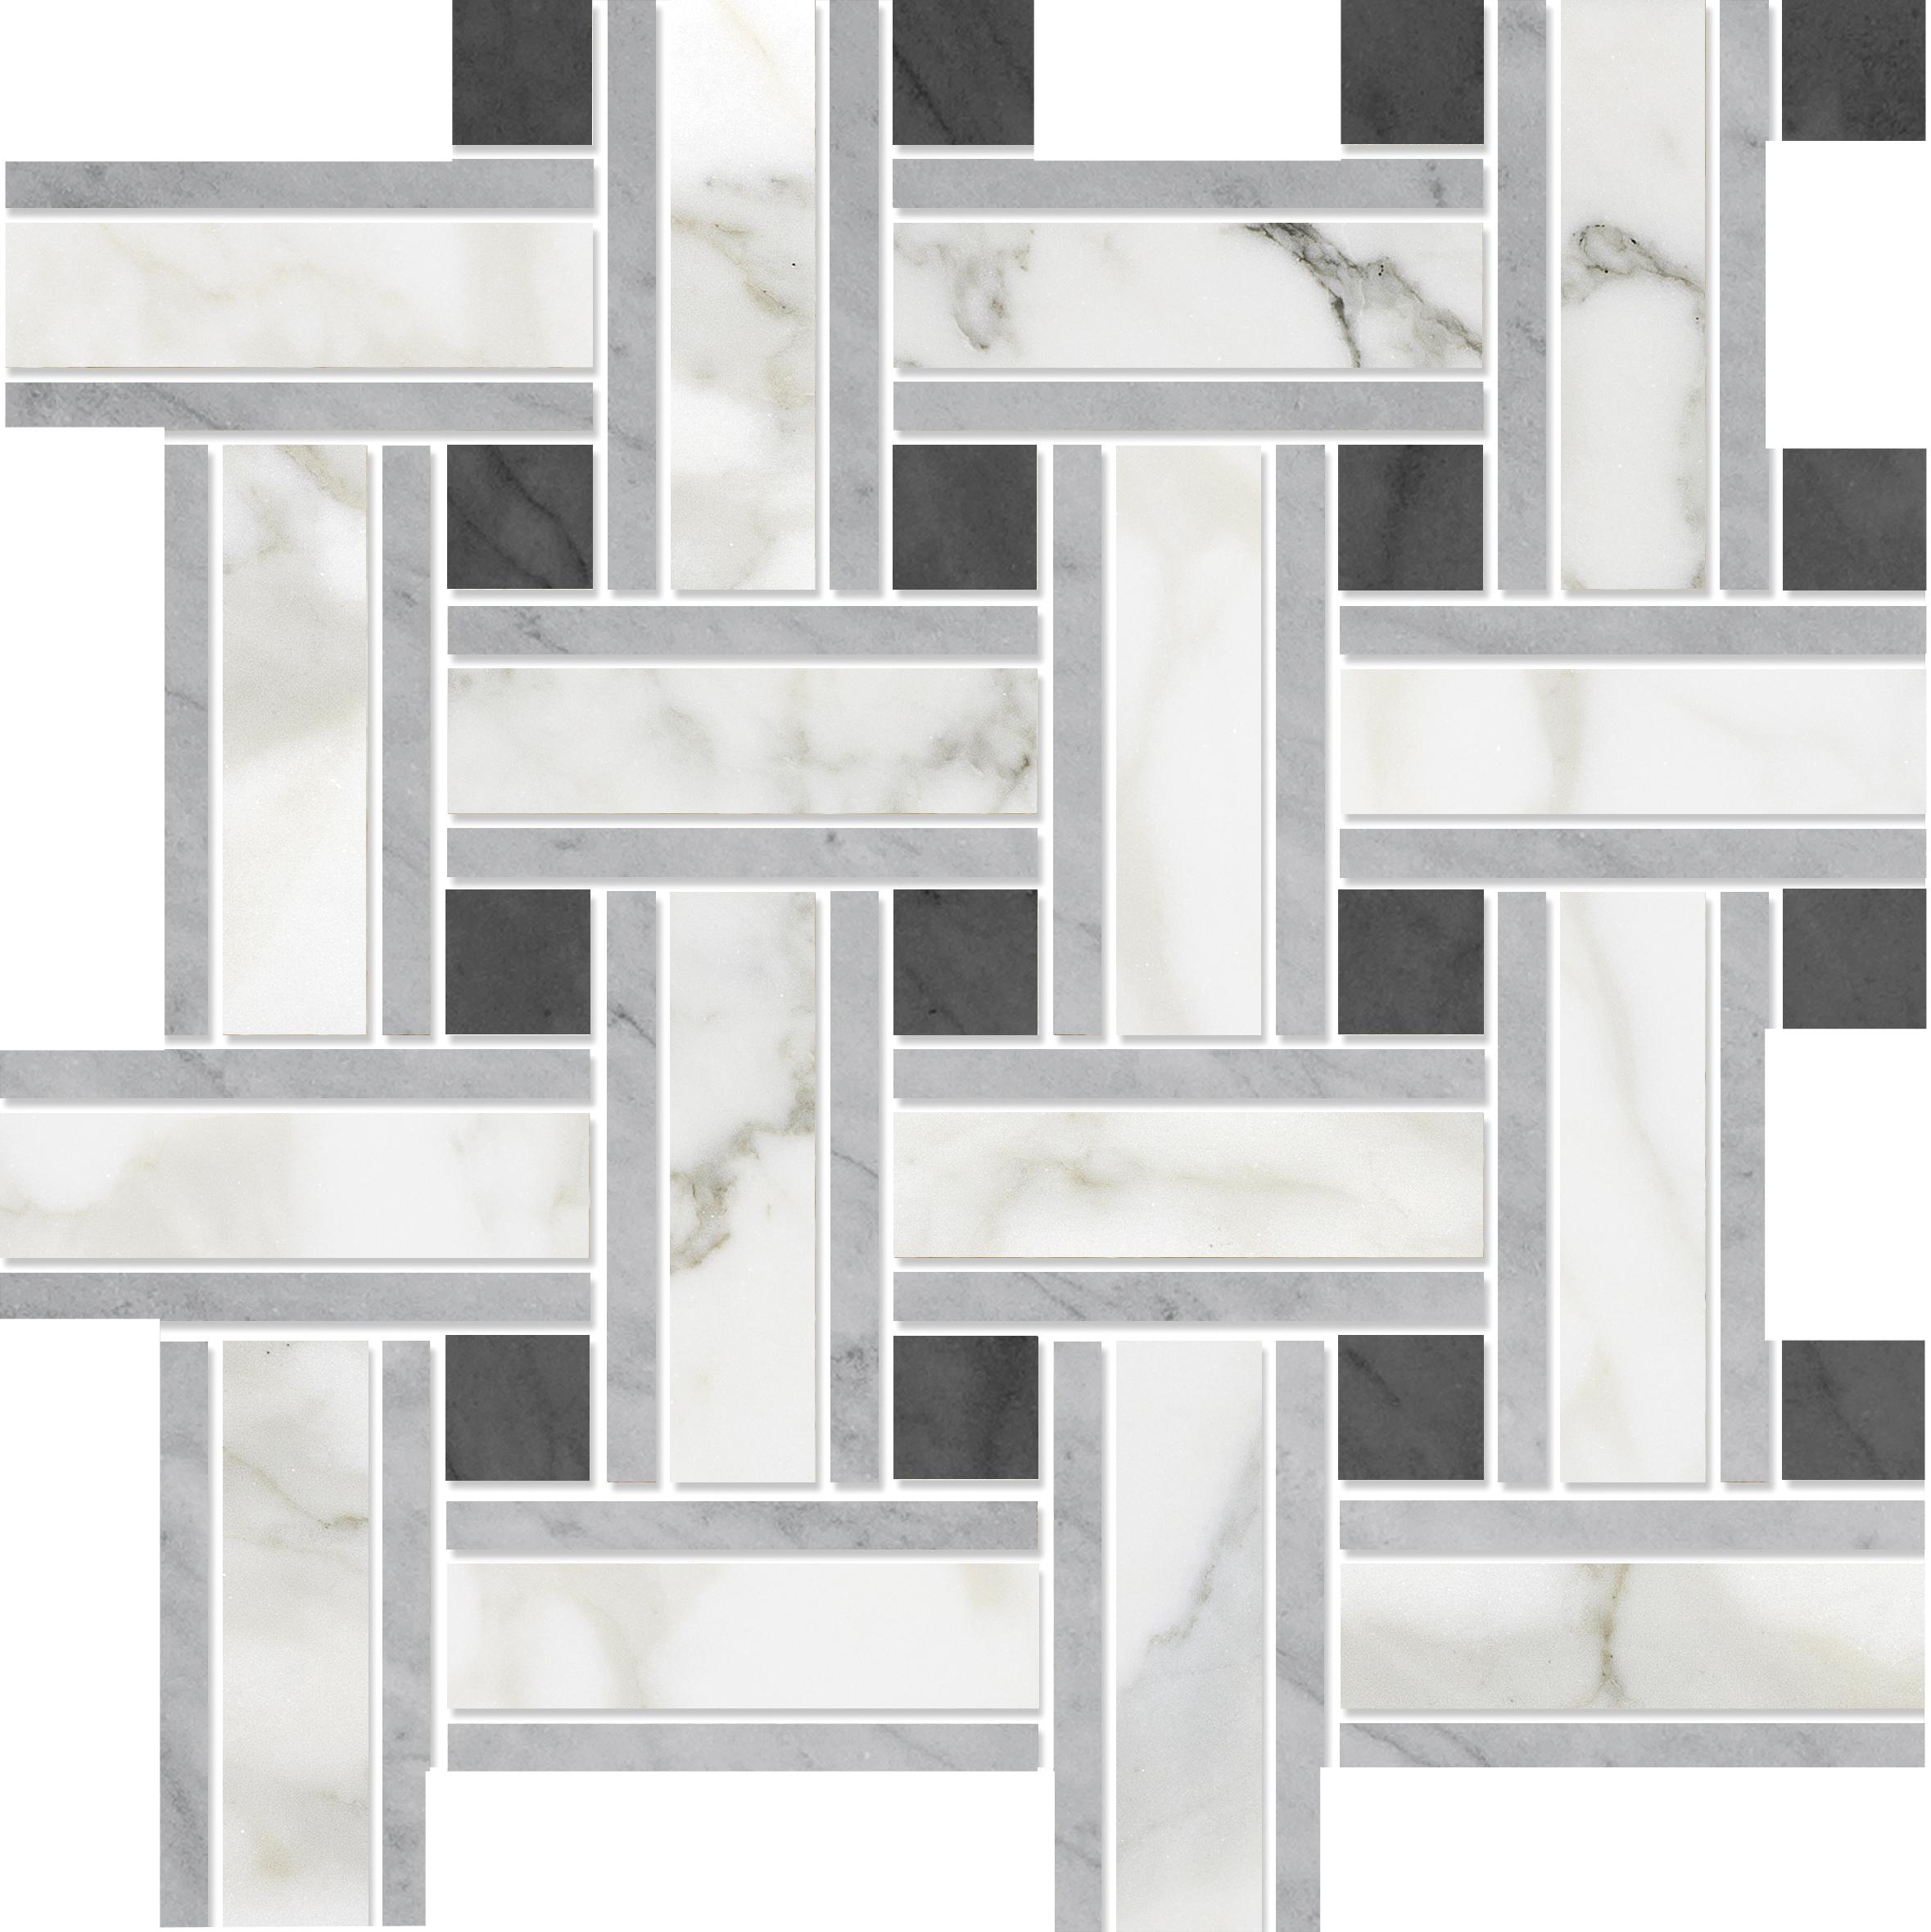 "MS90076 calacatta gold modern polished lattice mosaic 12""x12""x3/8"" sheets"